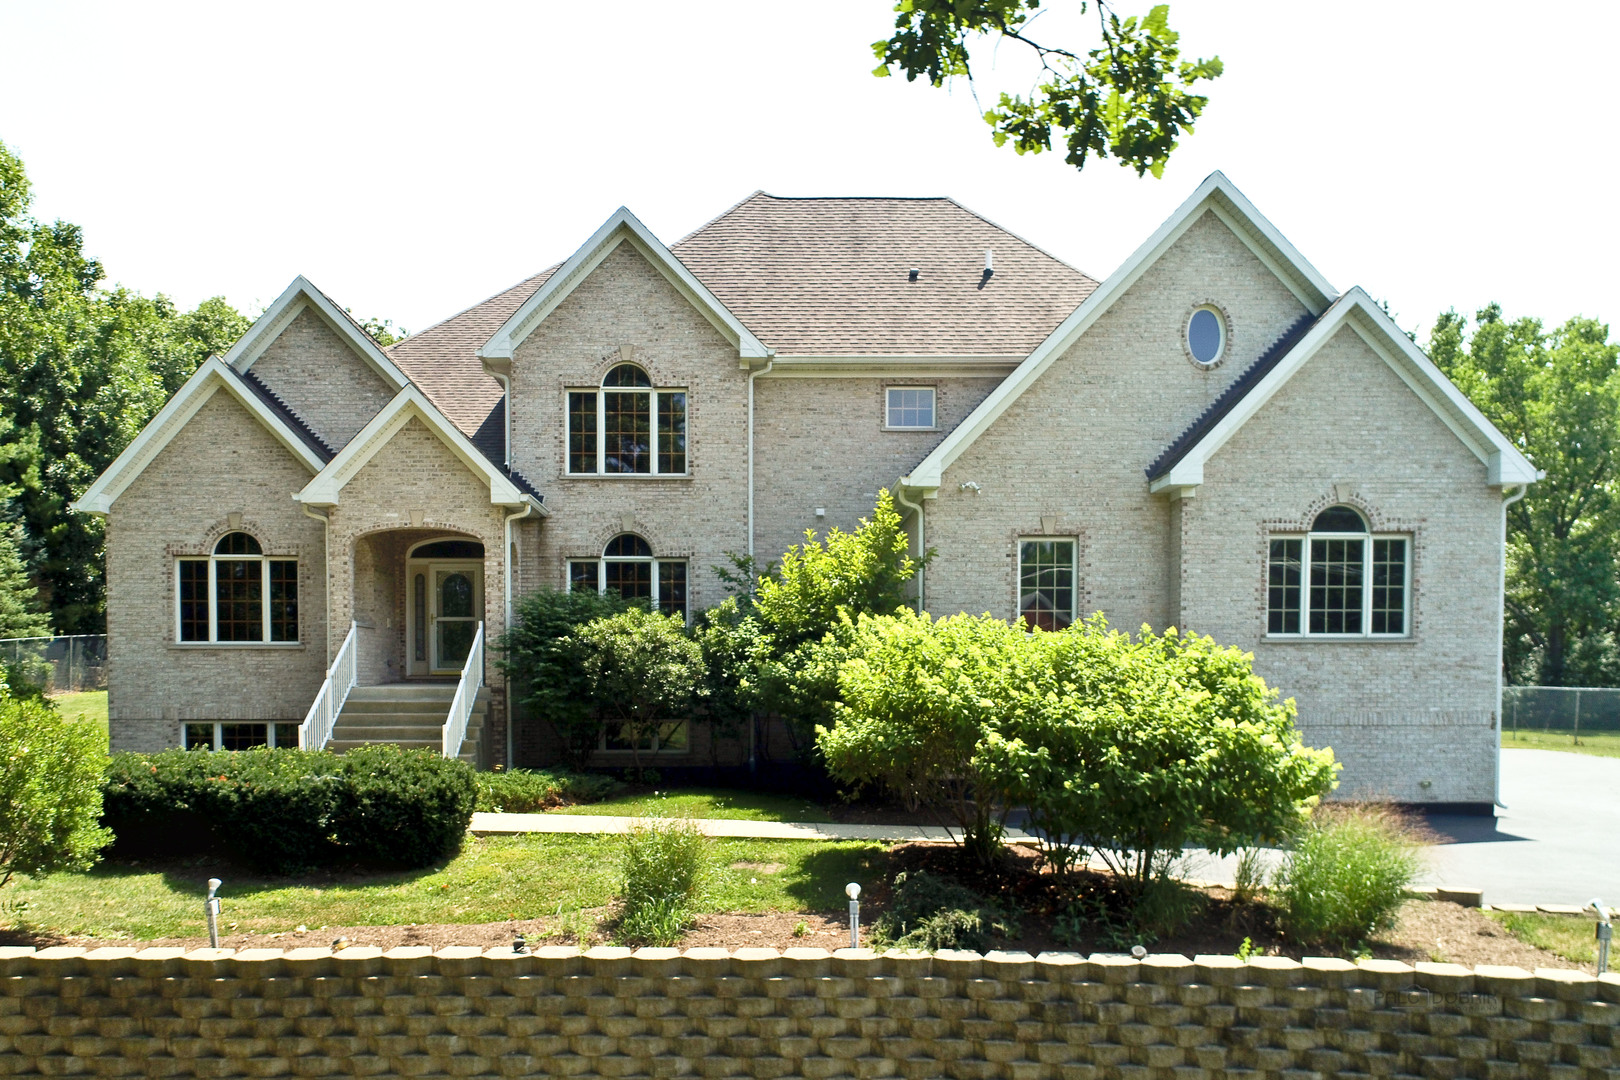 24765 West Petite Lake Road, Lake Villa, Illinois 60046